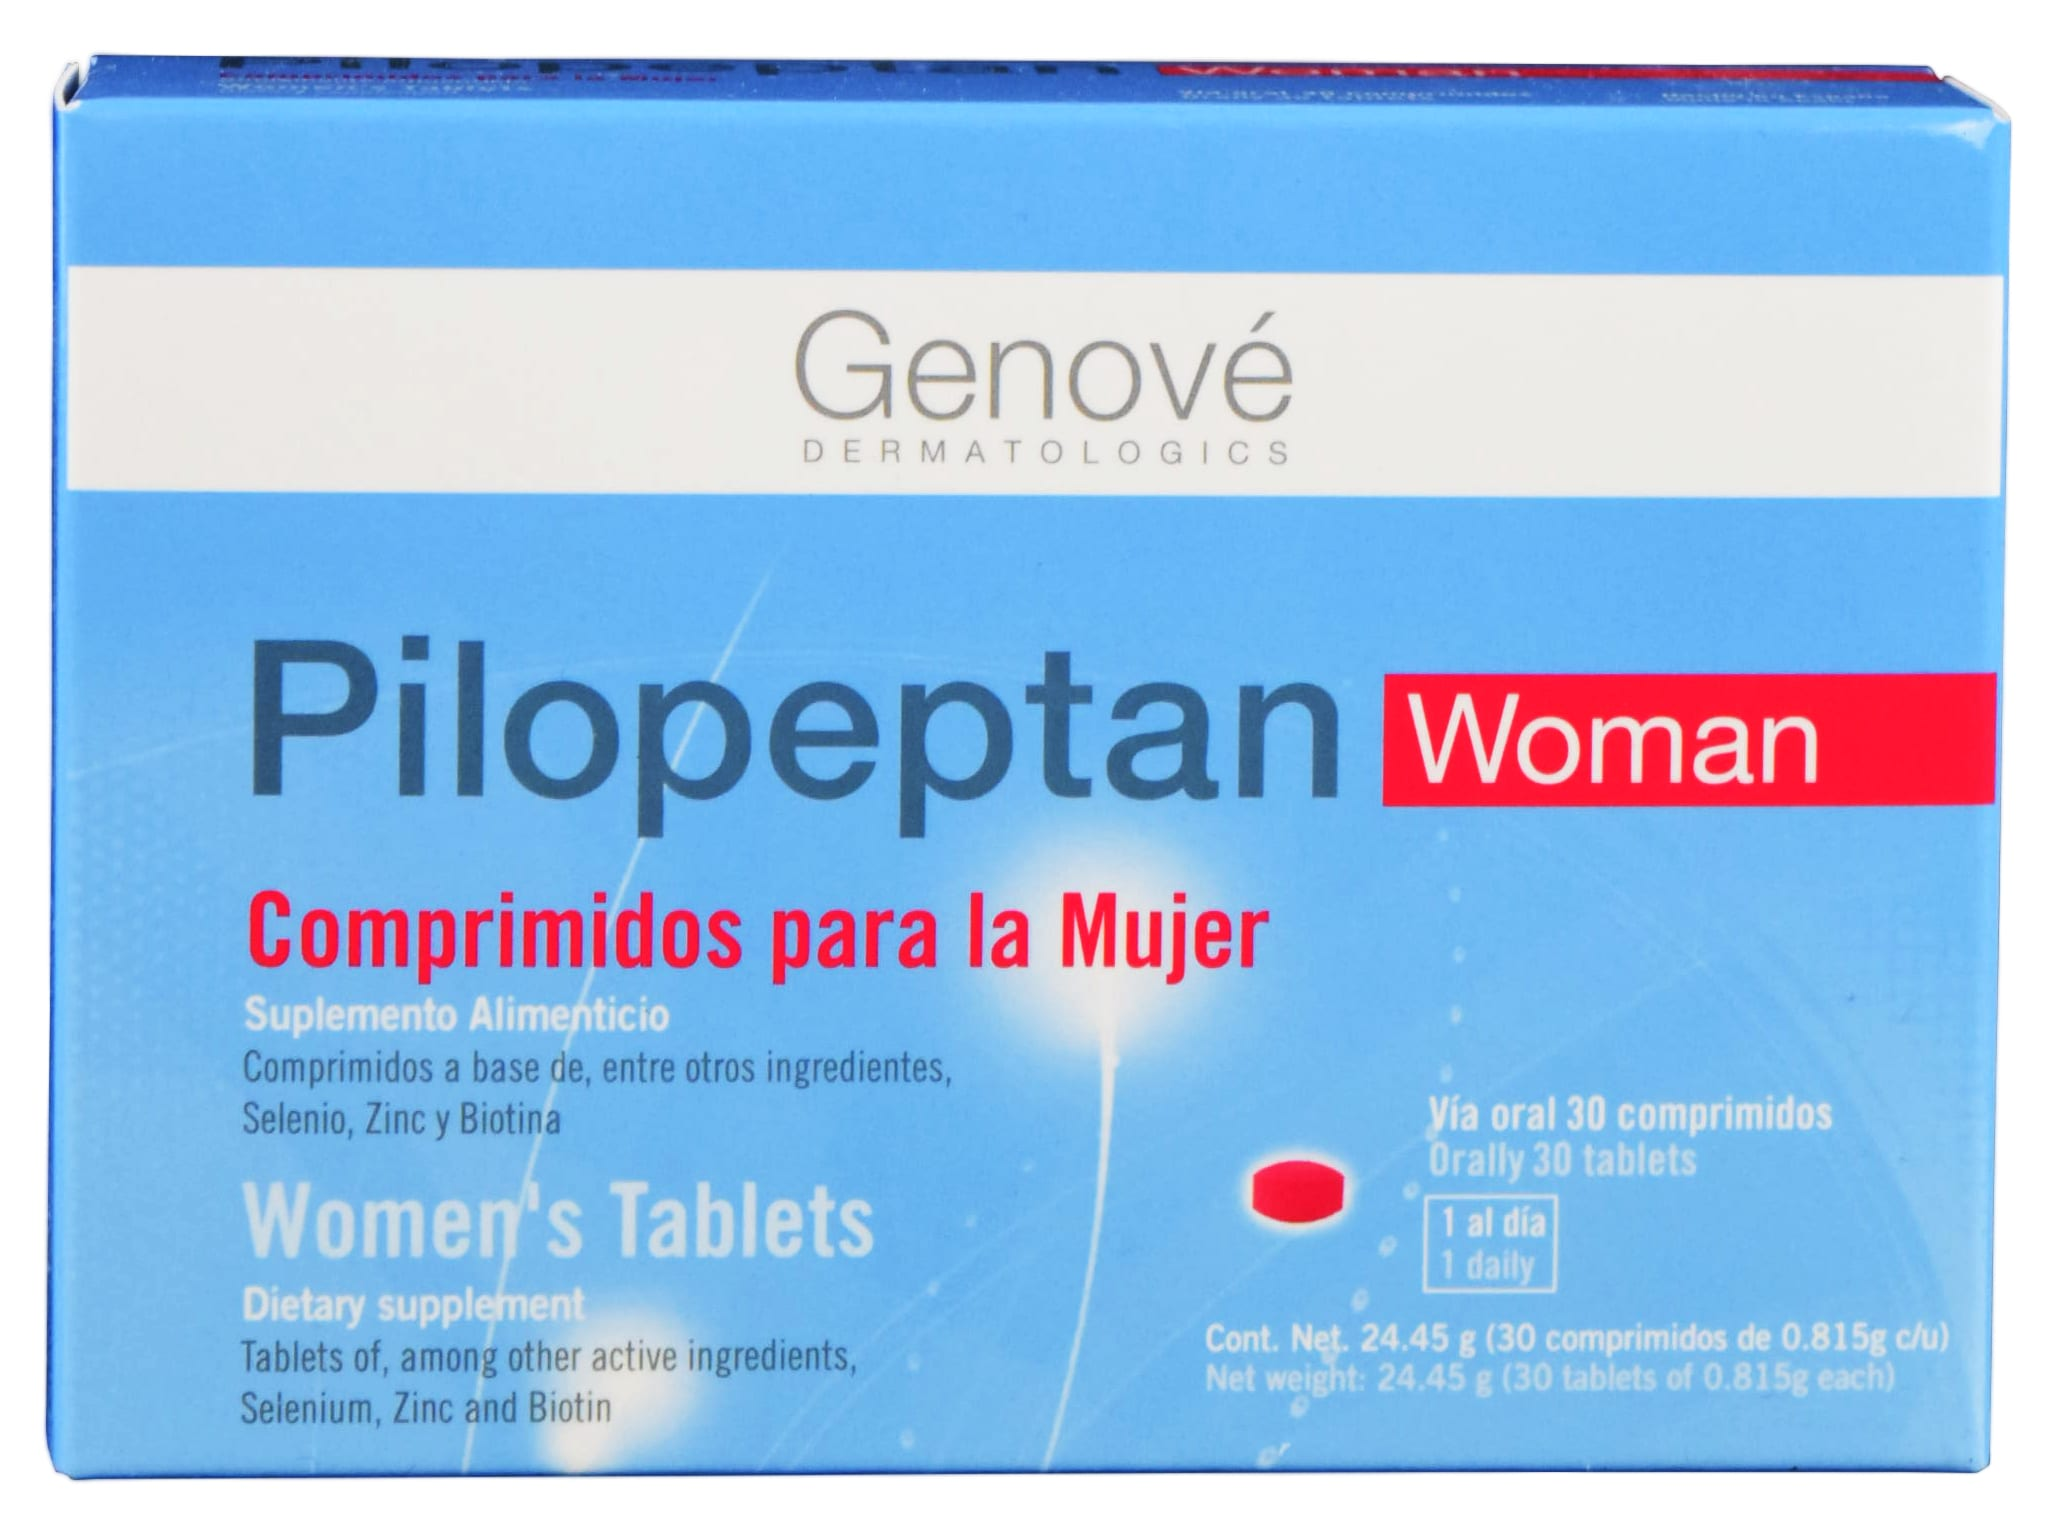 Comprar Pilopeptan Woman 1 Caja 30 Comprimidos